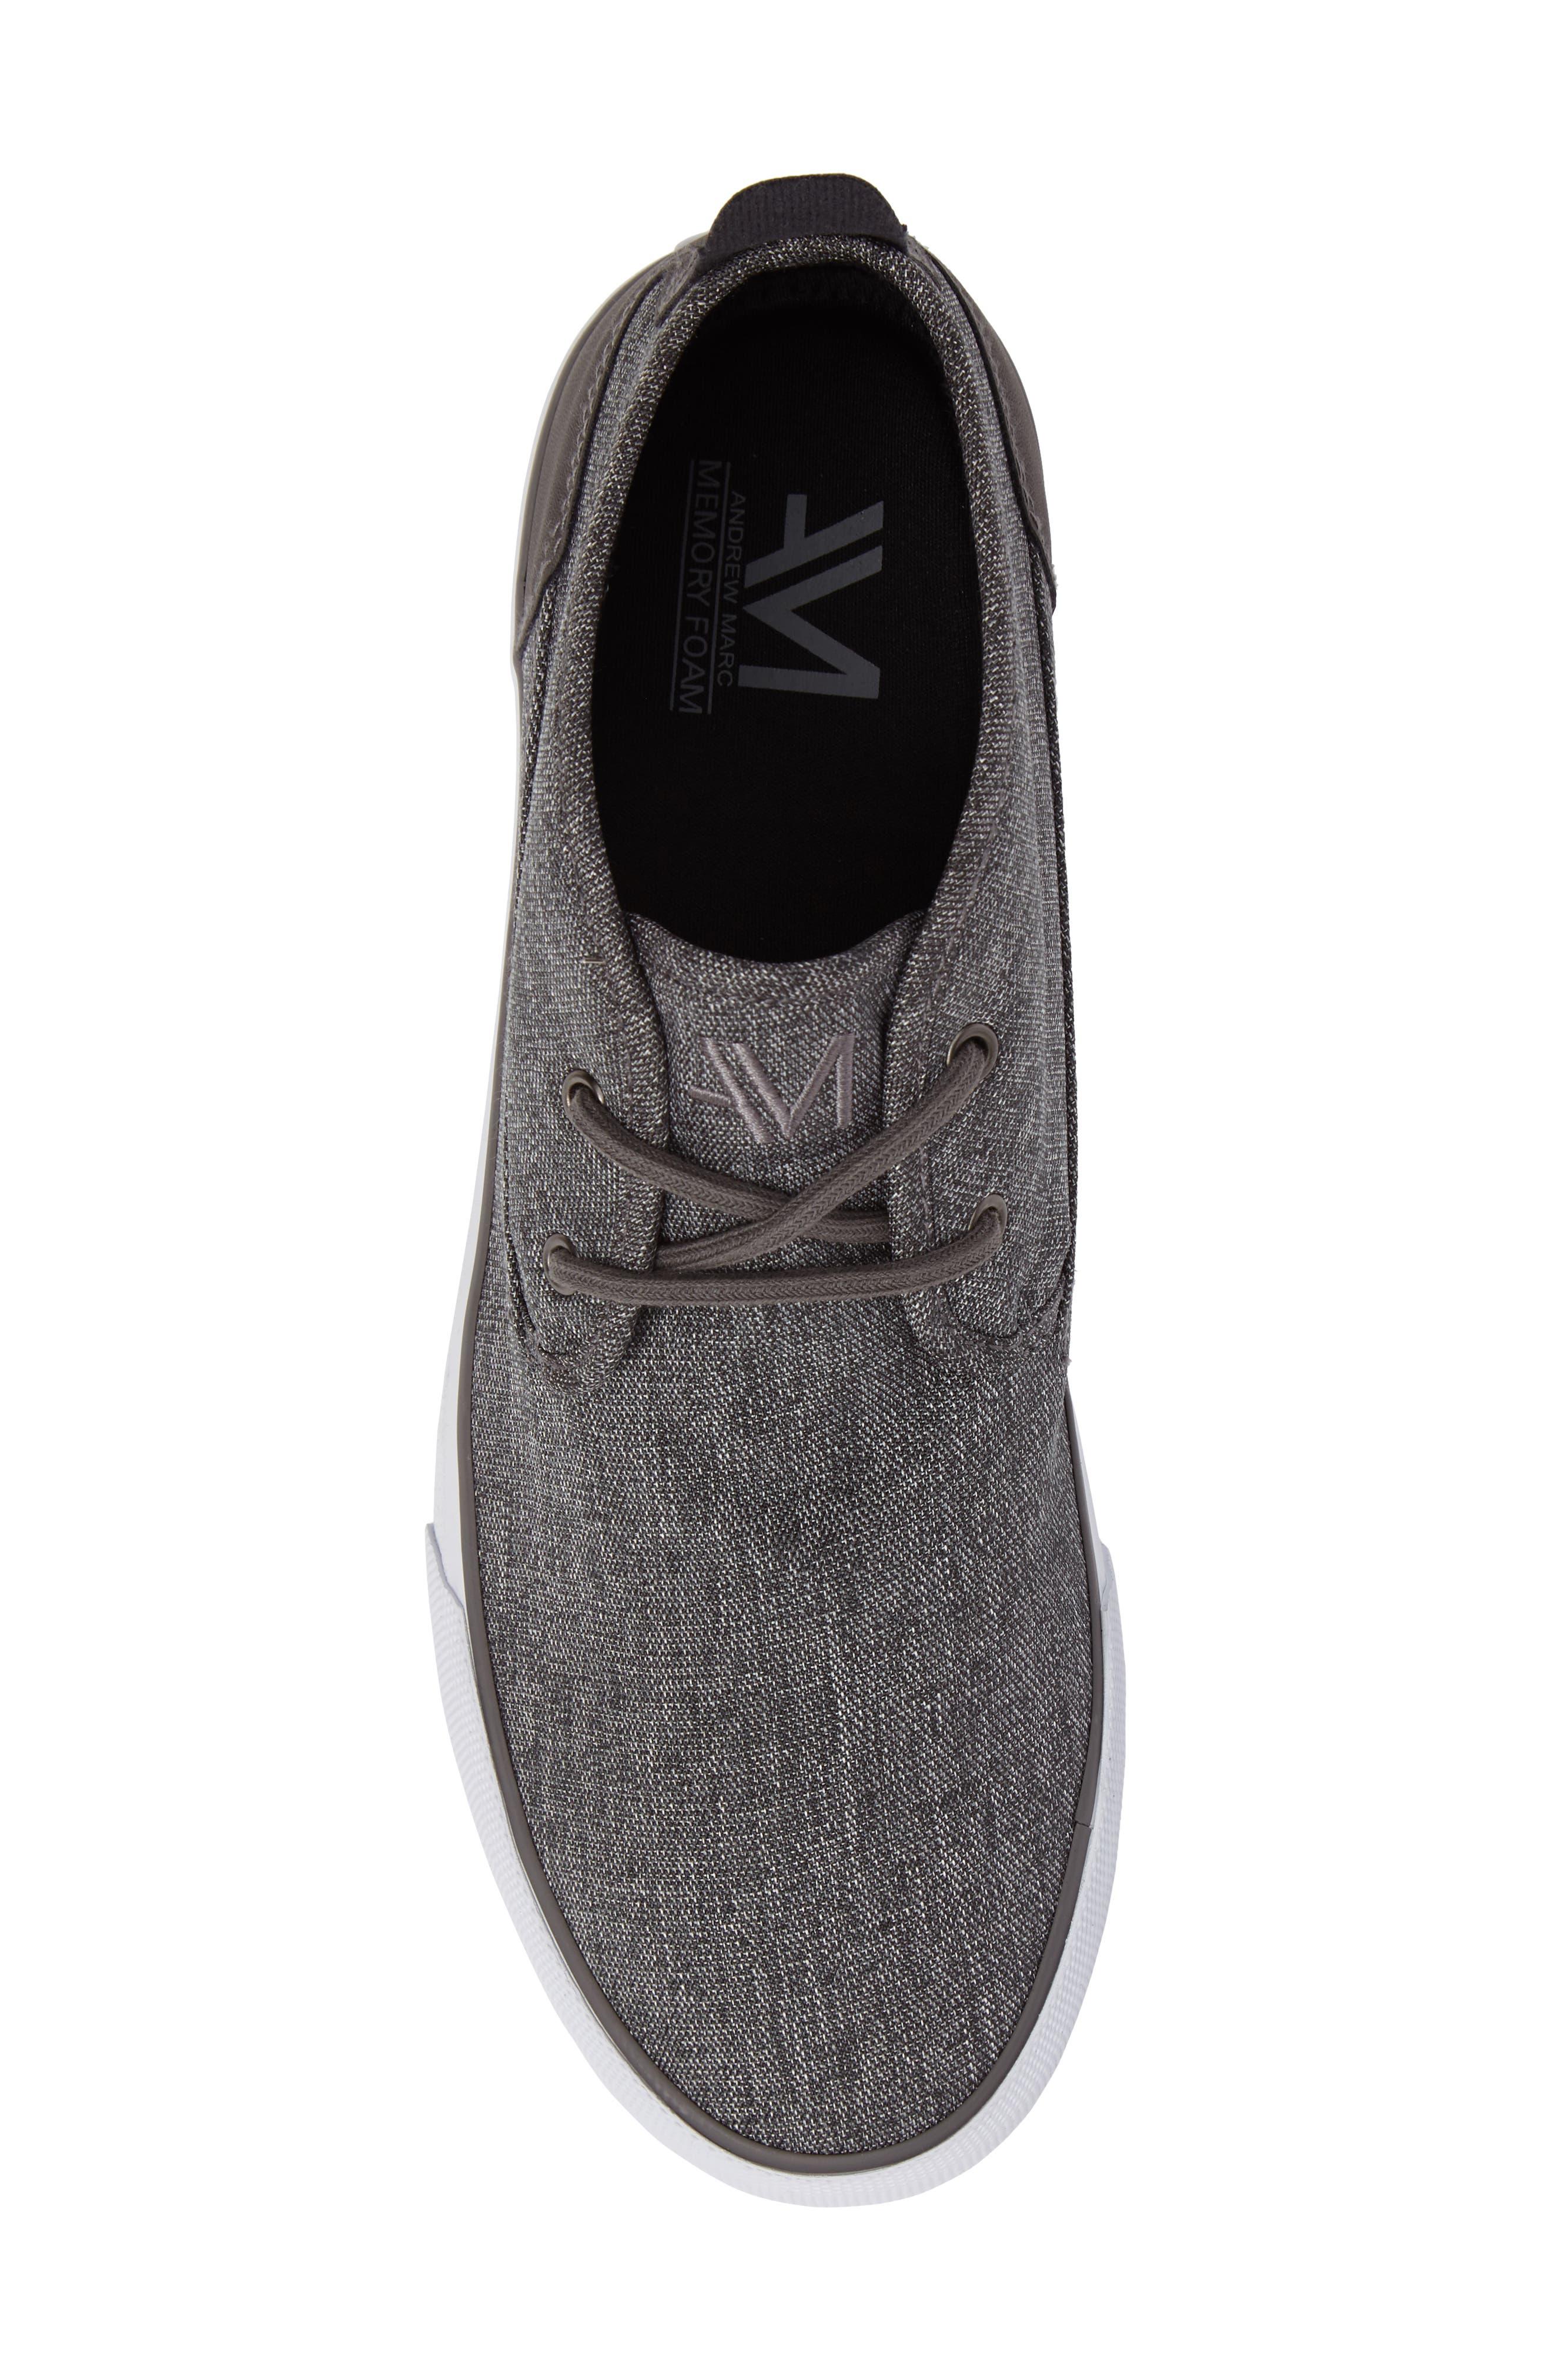 Reade Chukka Sneaker,                             Alternate thumbnail 5, color,                             Charcoal/Dk Charcoal/White